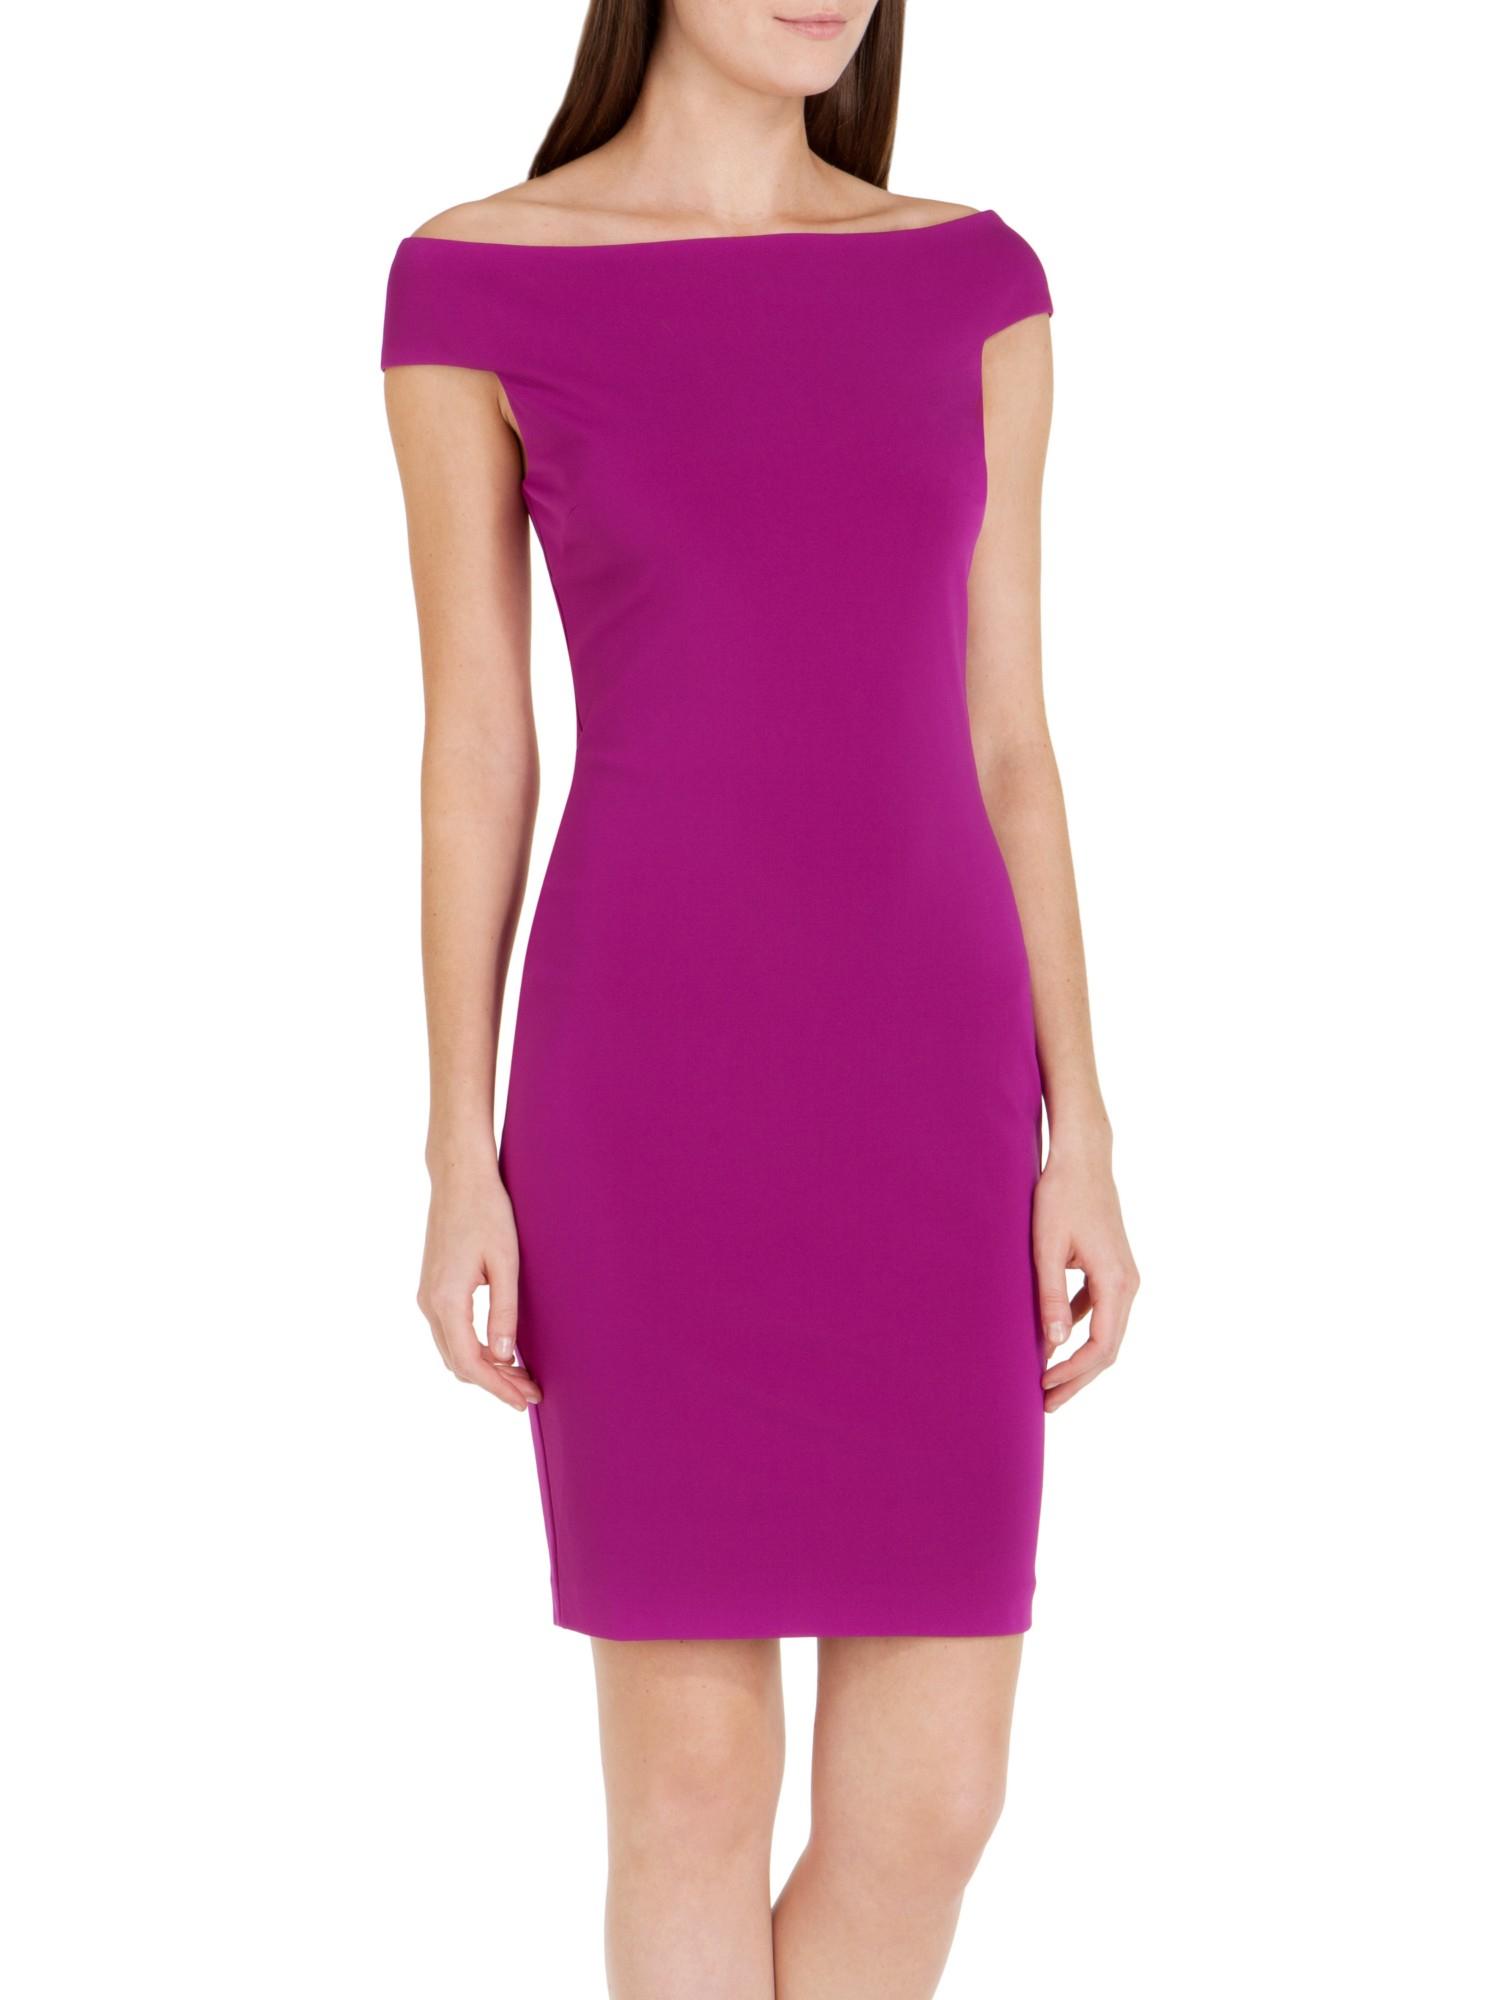 Único Ted Baker Cocktail Dress Ornamento - Ideas de Vestidos de ...